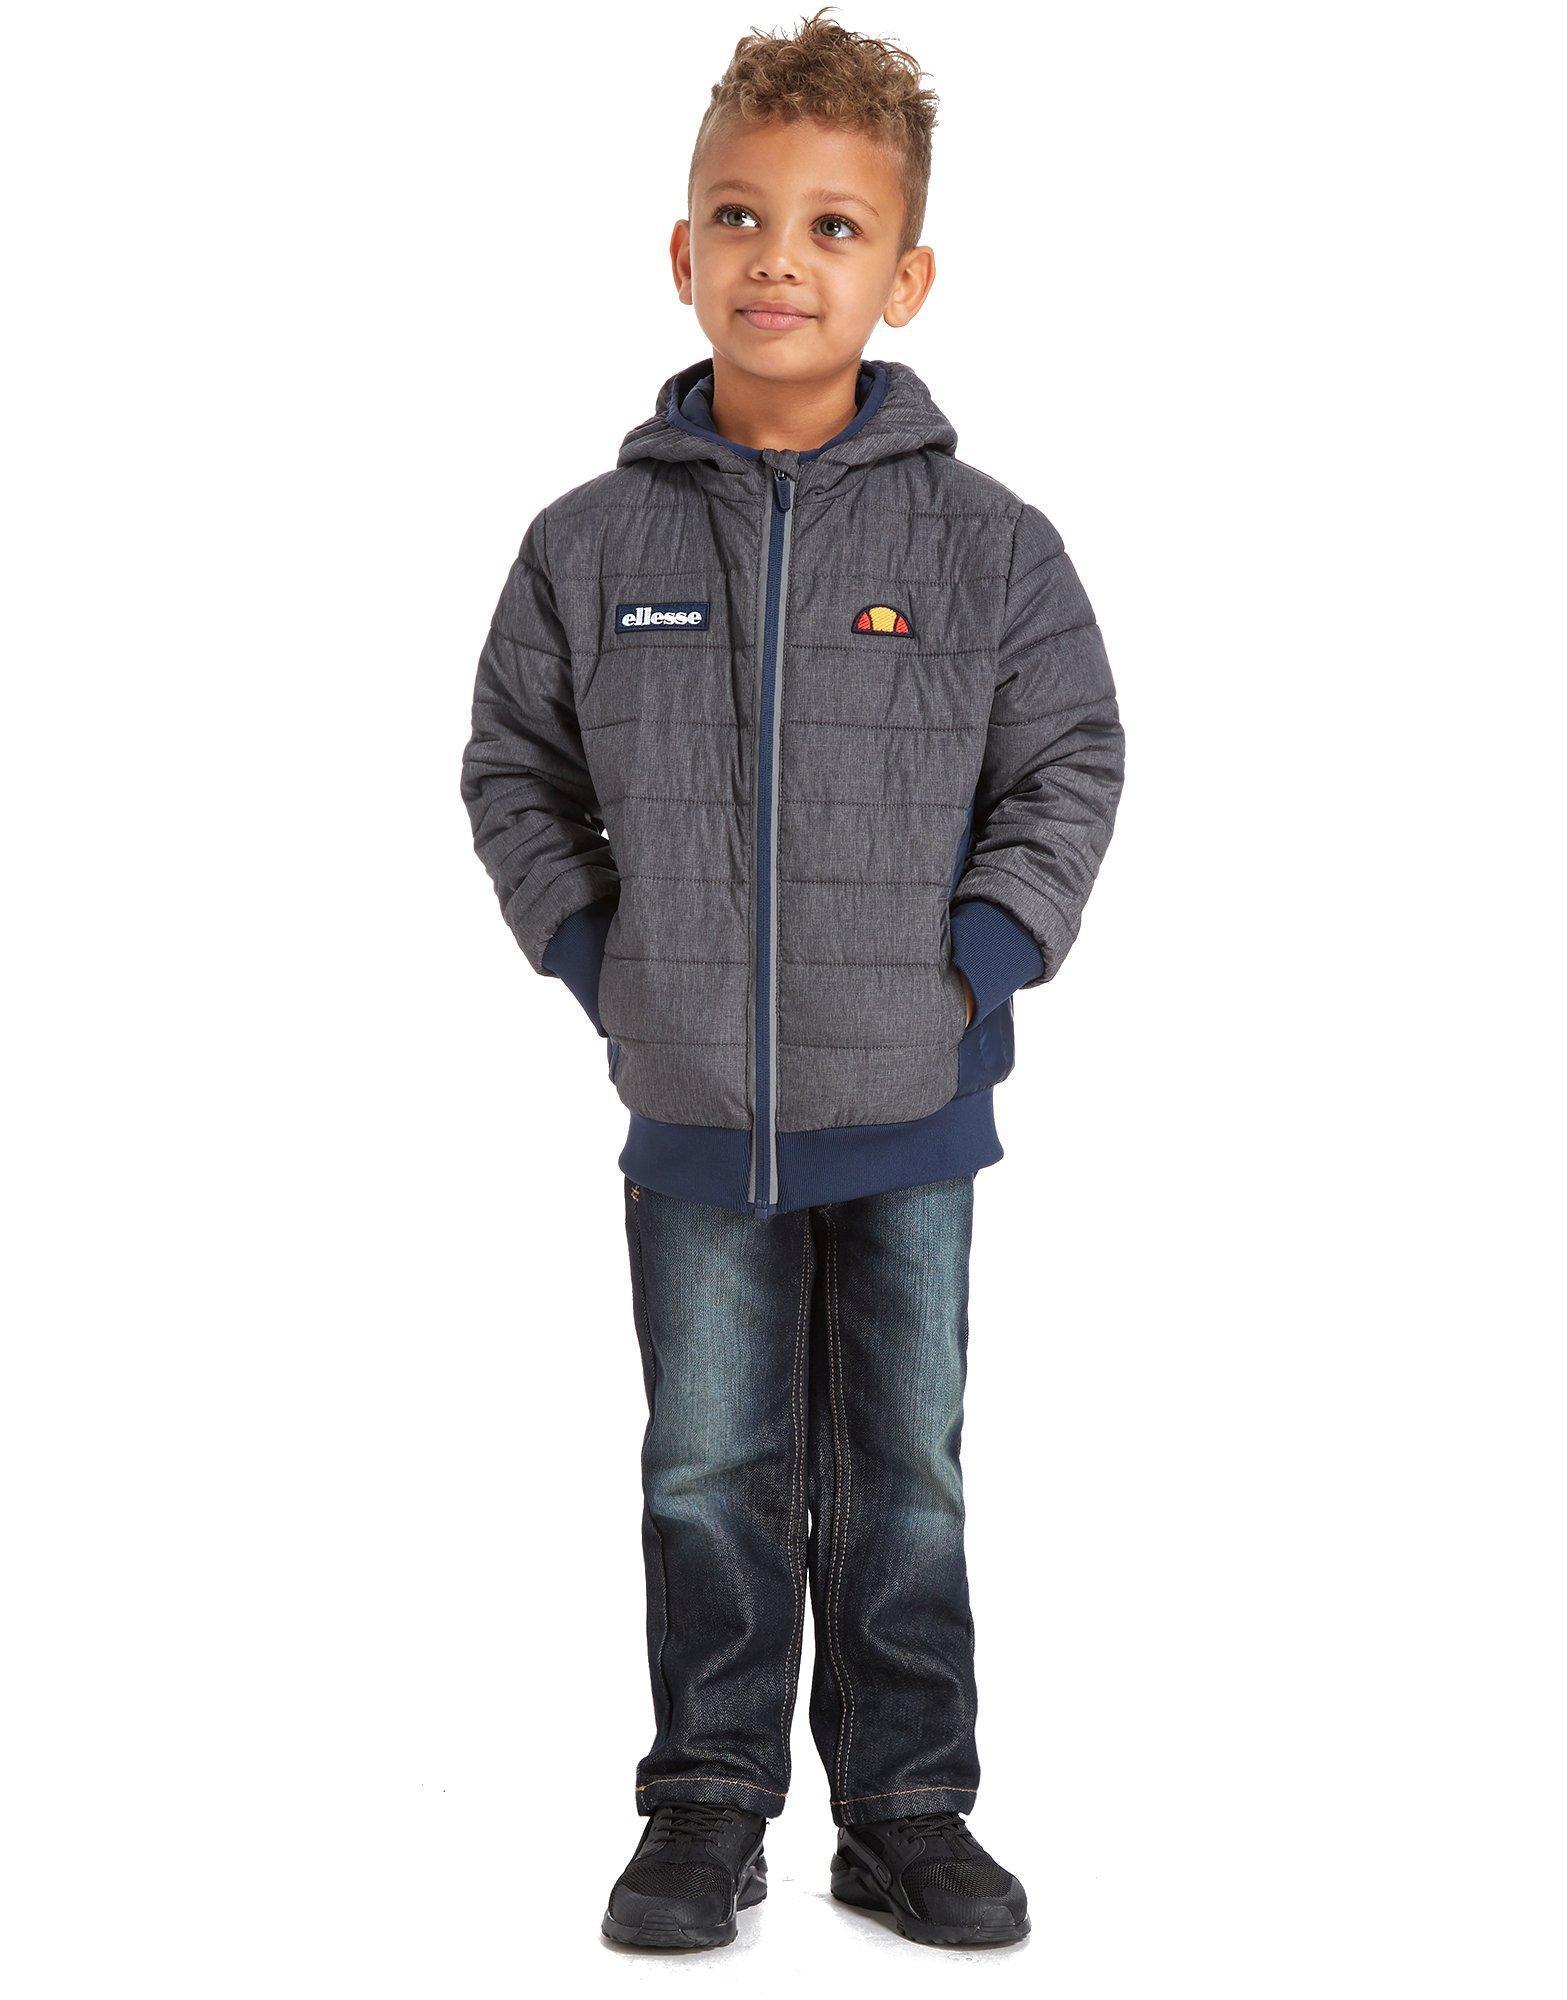 Ellesse Synthetic Mustri Jacket Children in Grey/Navy (Grey) for Men